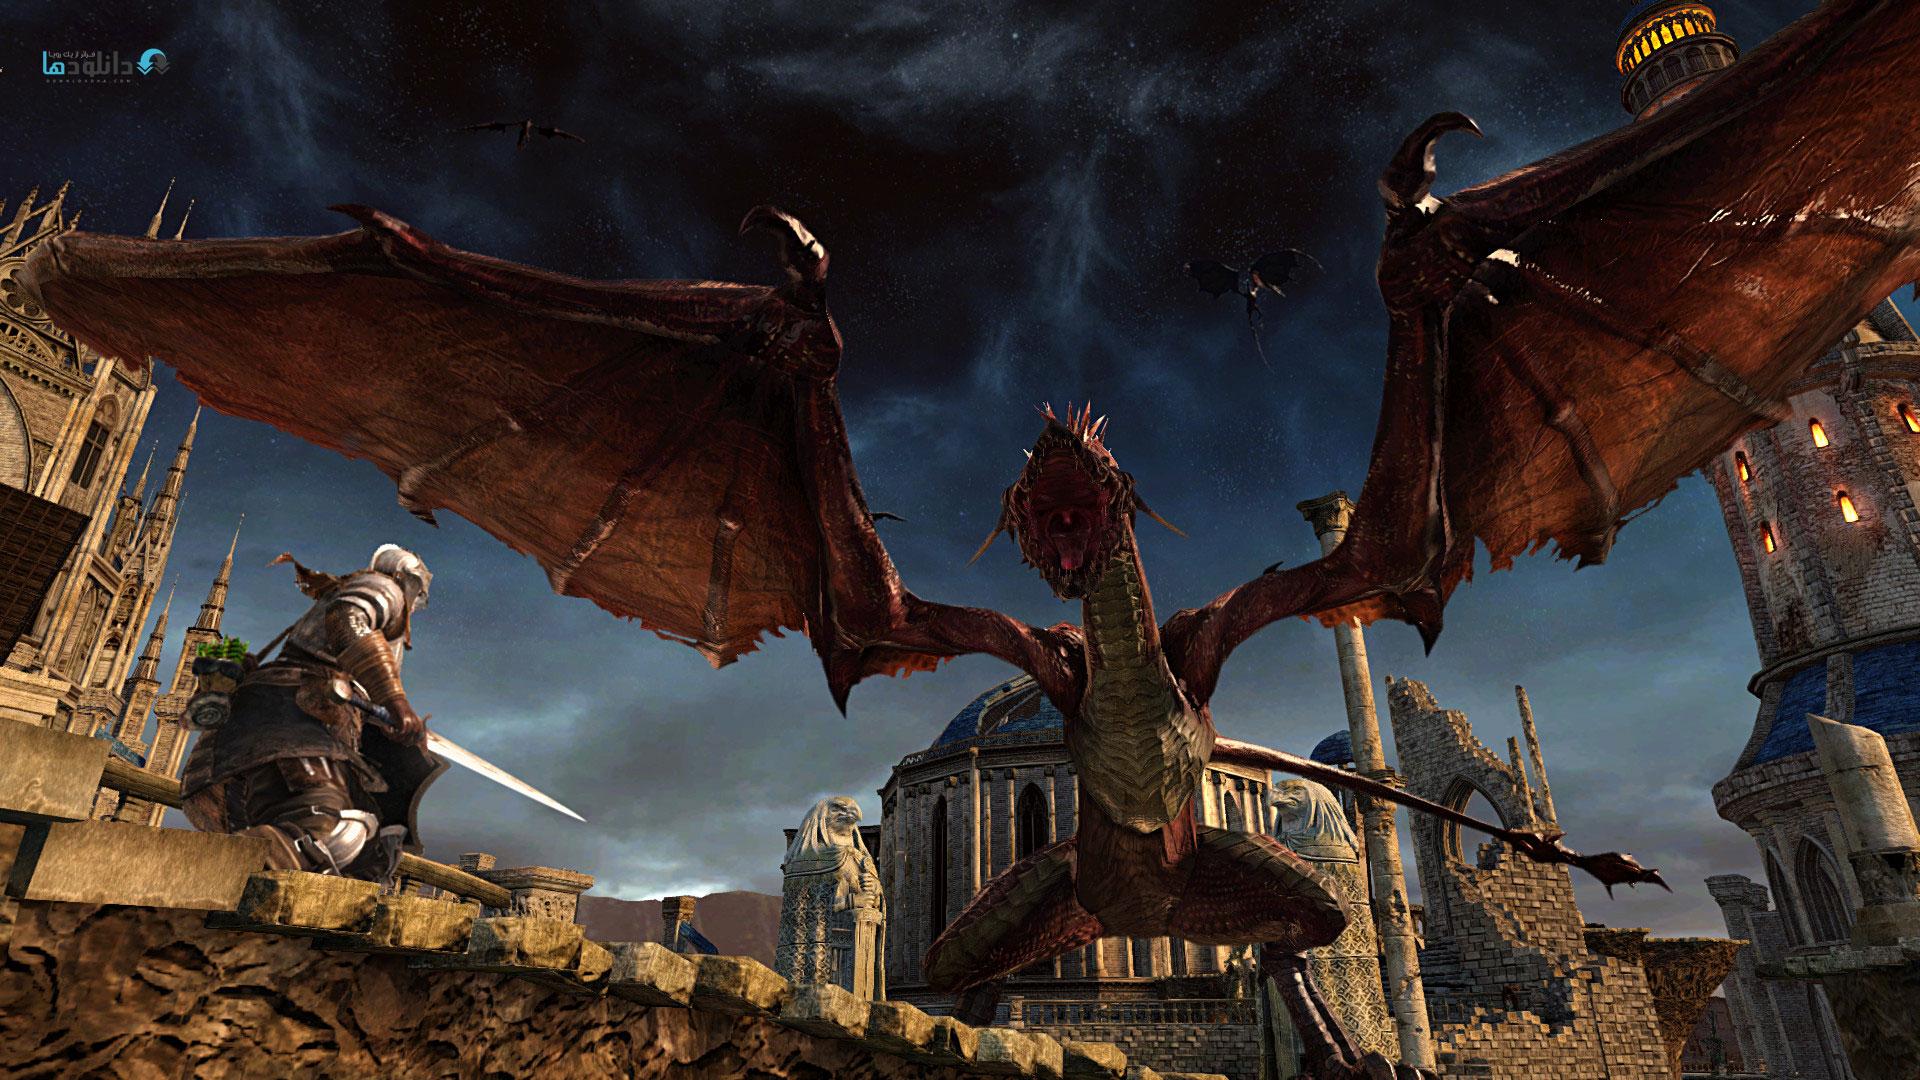 http://img5.downloadha.com/hosein/Game/April%202015/02/Dark-Souls-II-Scholar-of-the-First-Sin-screenshots-04-large.jpg